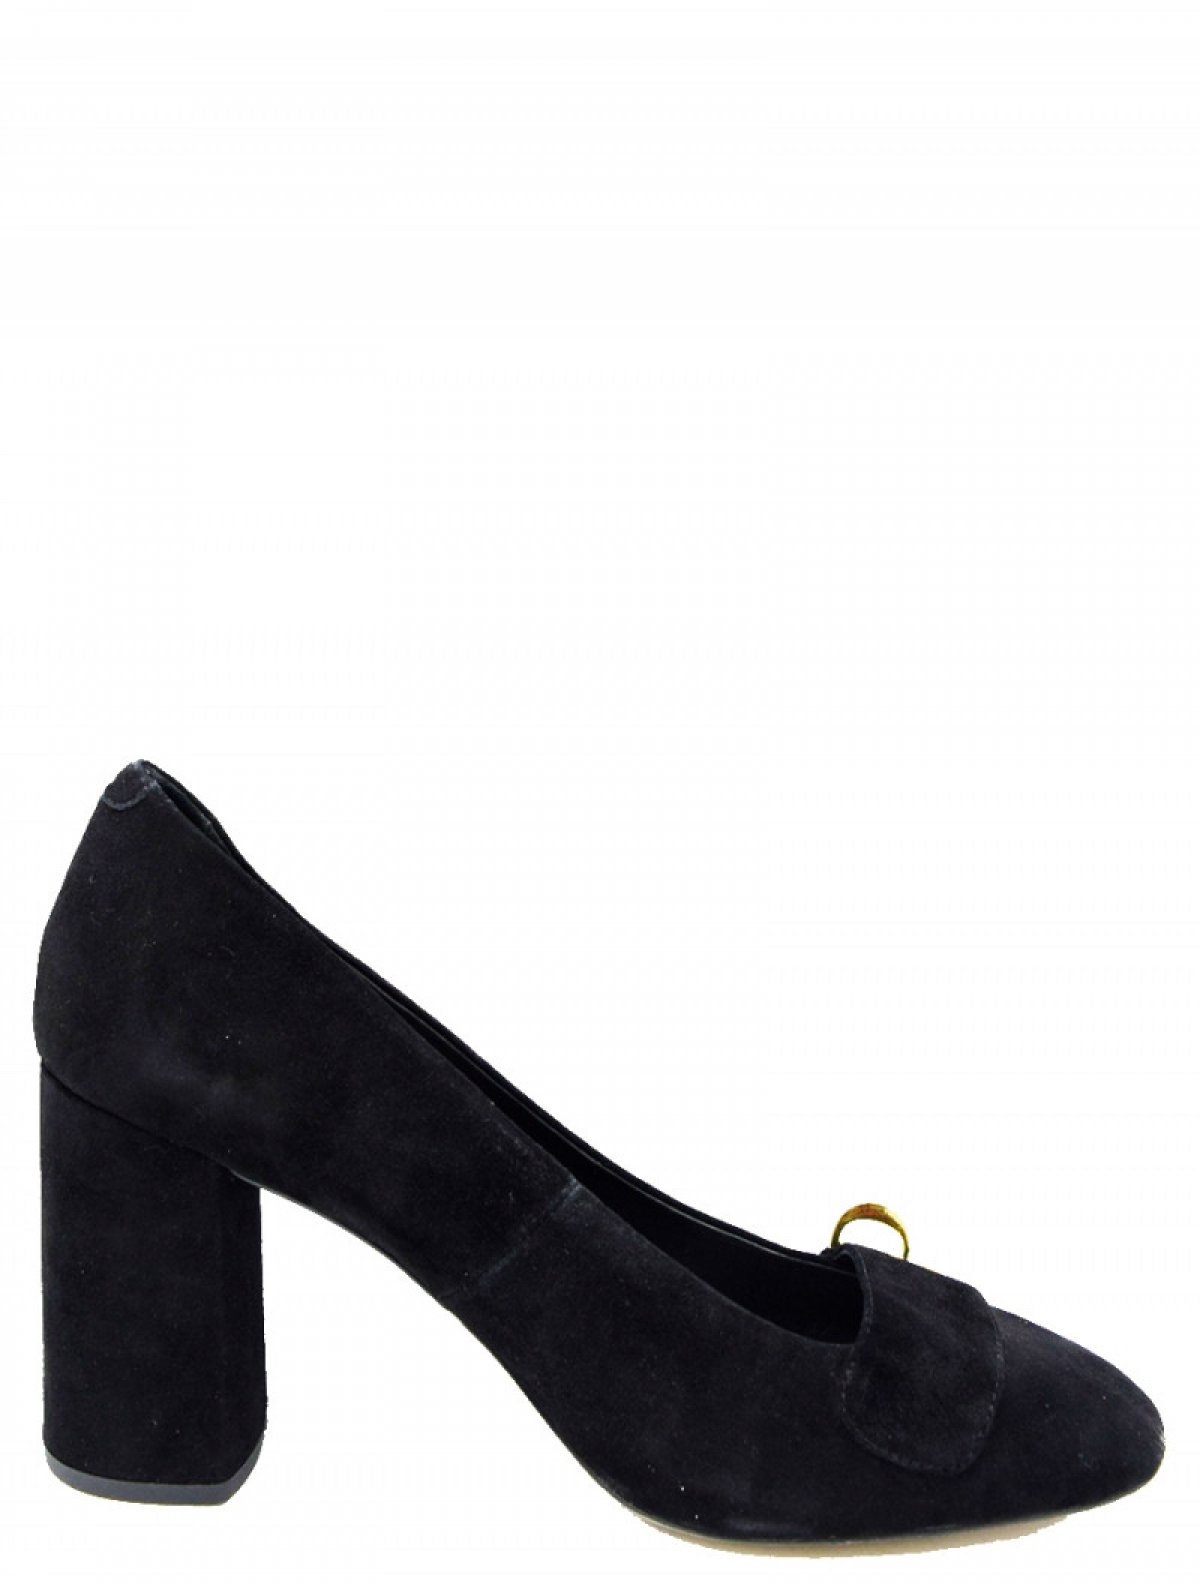 Giovanni Aidini 8102-174-241D женские туфли